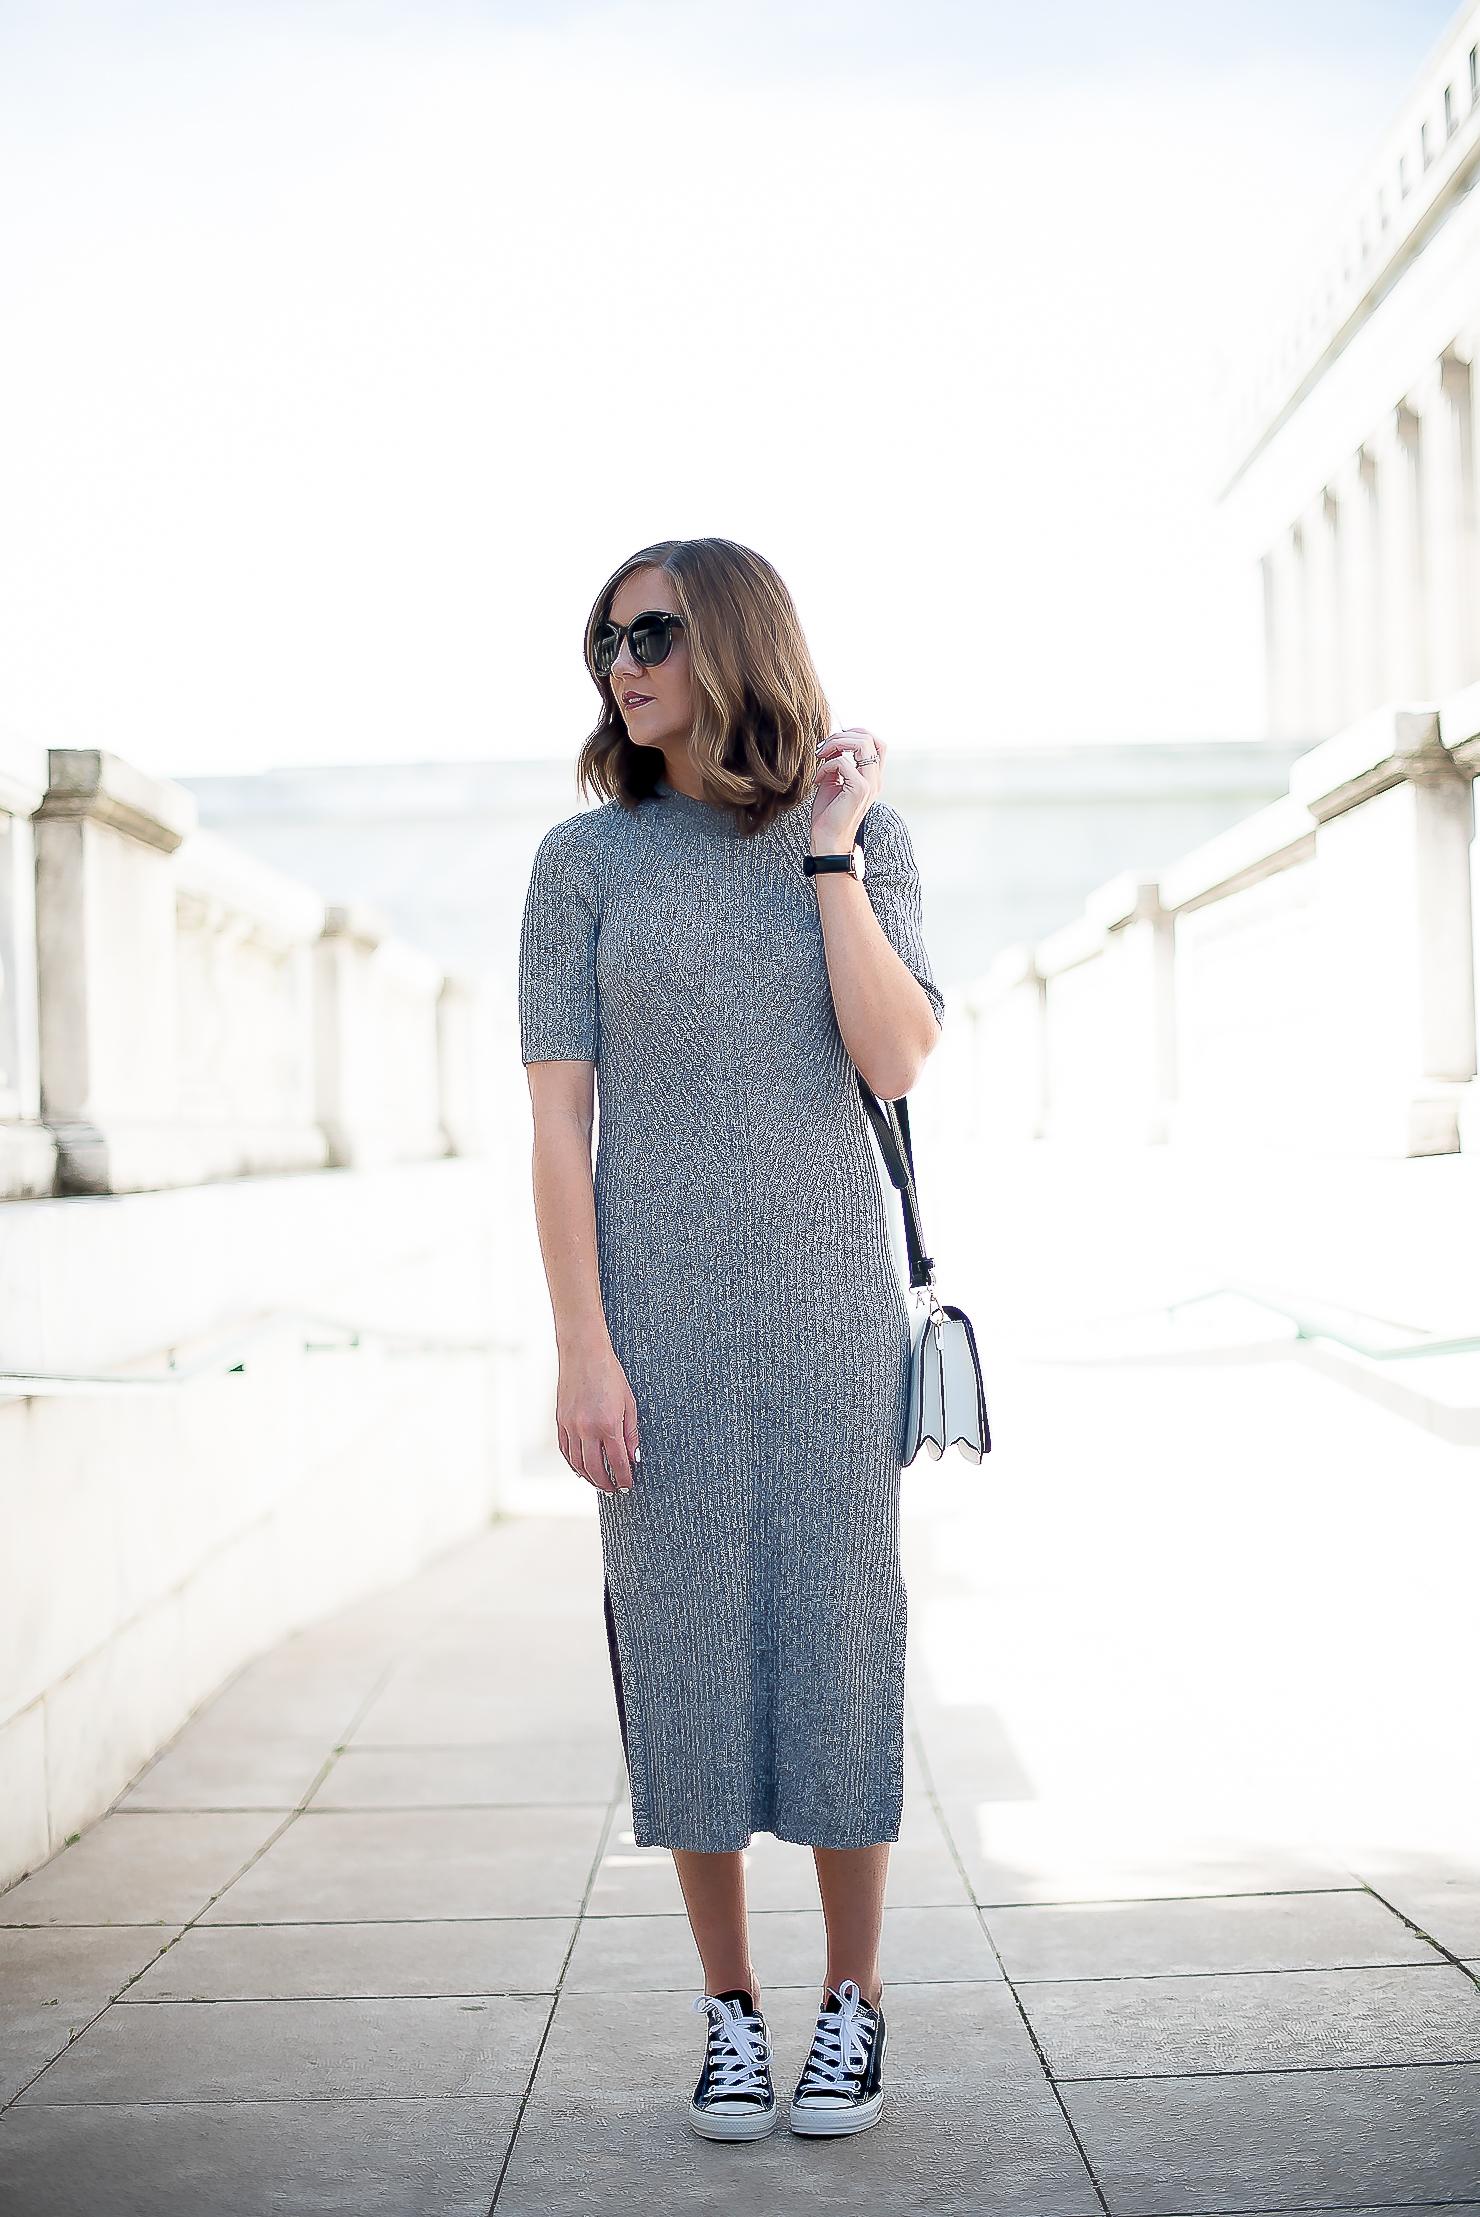 6ce33590c07 hm-grey-cotton-ribbed-midi-dress-black-converse-white-sole-society ...